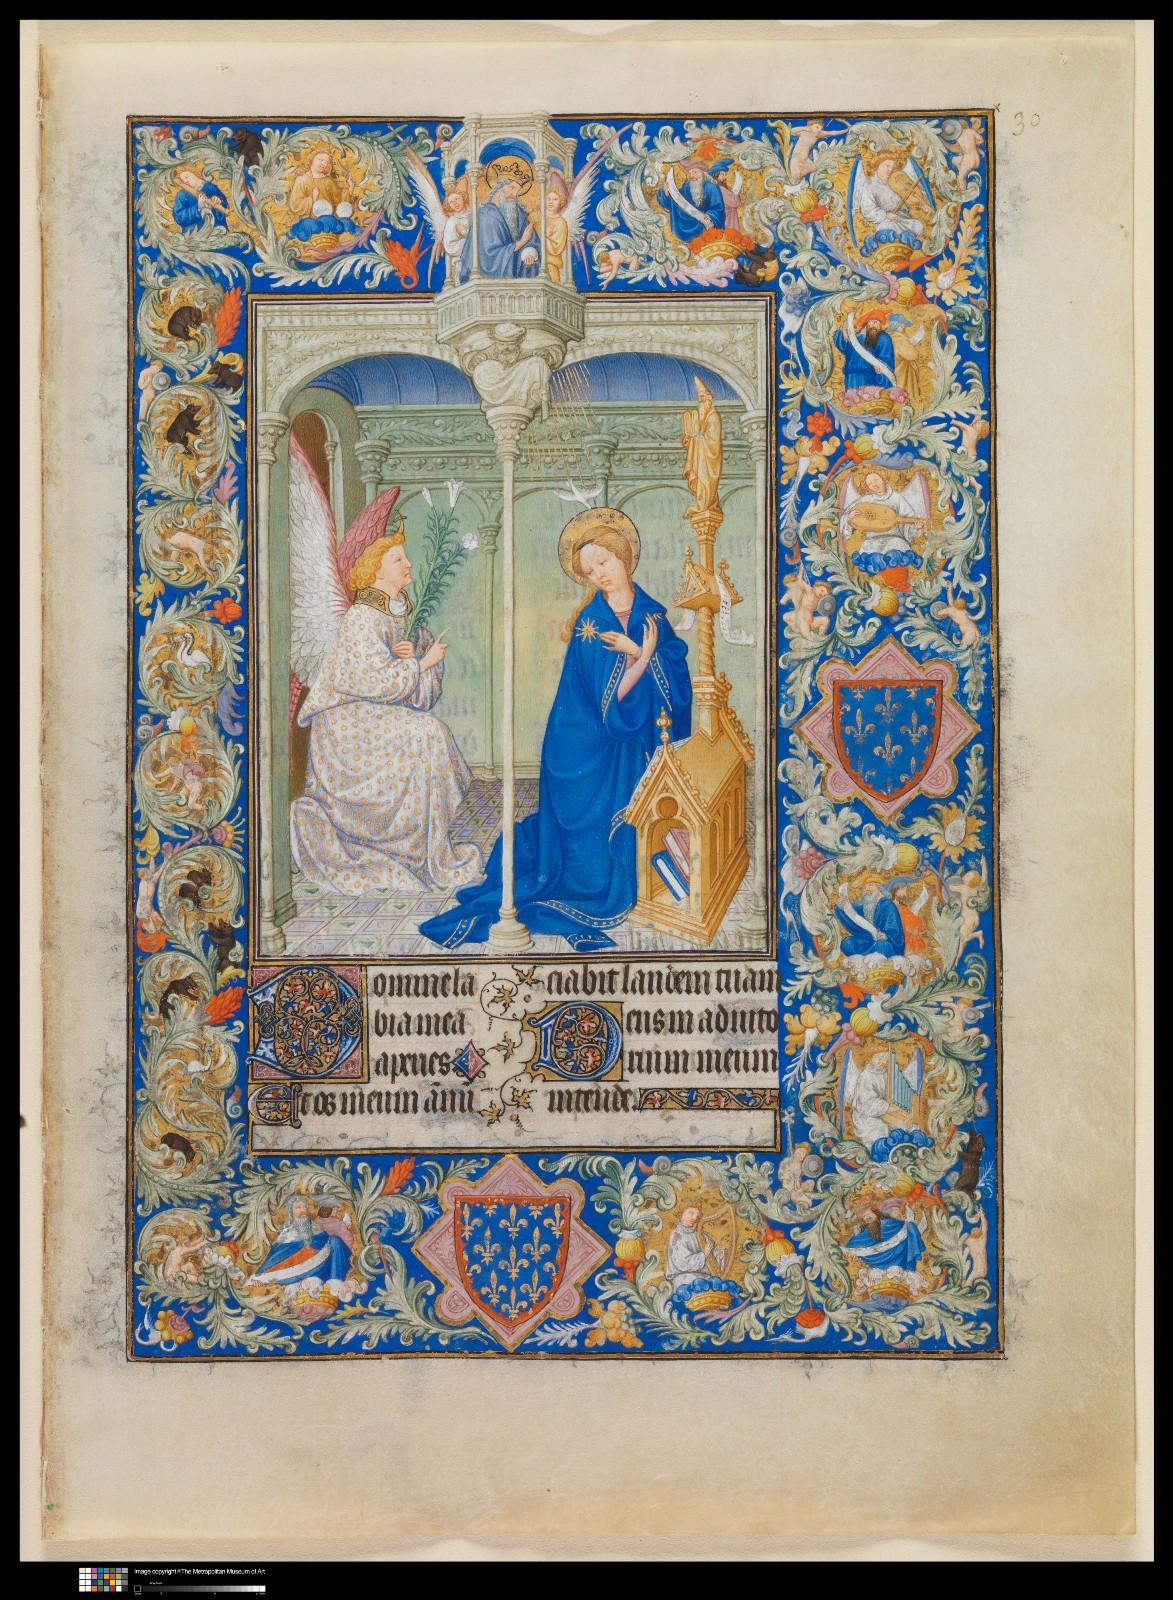 """ Medieval Art A Resource for Educators "". Fratelli Limbourg, ""The belles heures of Jean de france, Duc de Berry"", 1405-09 circa"